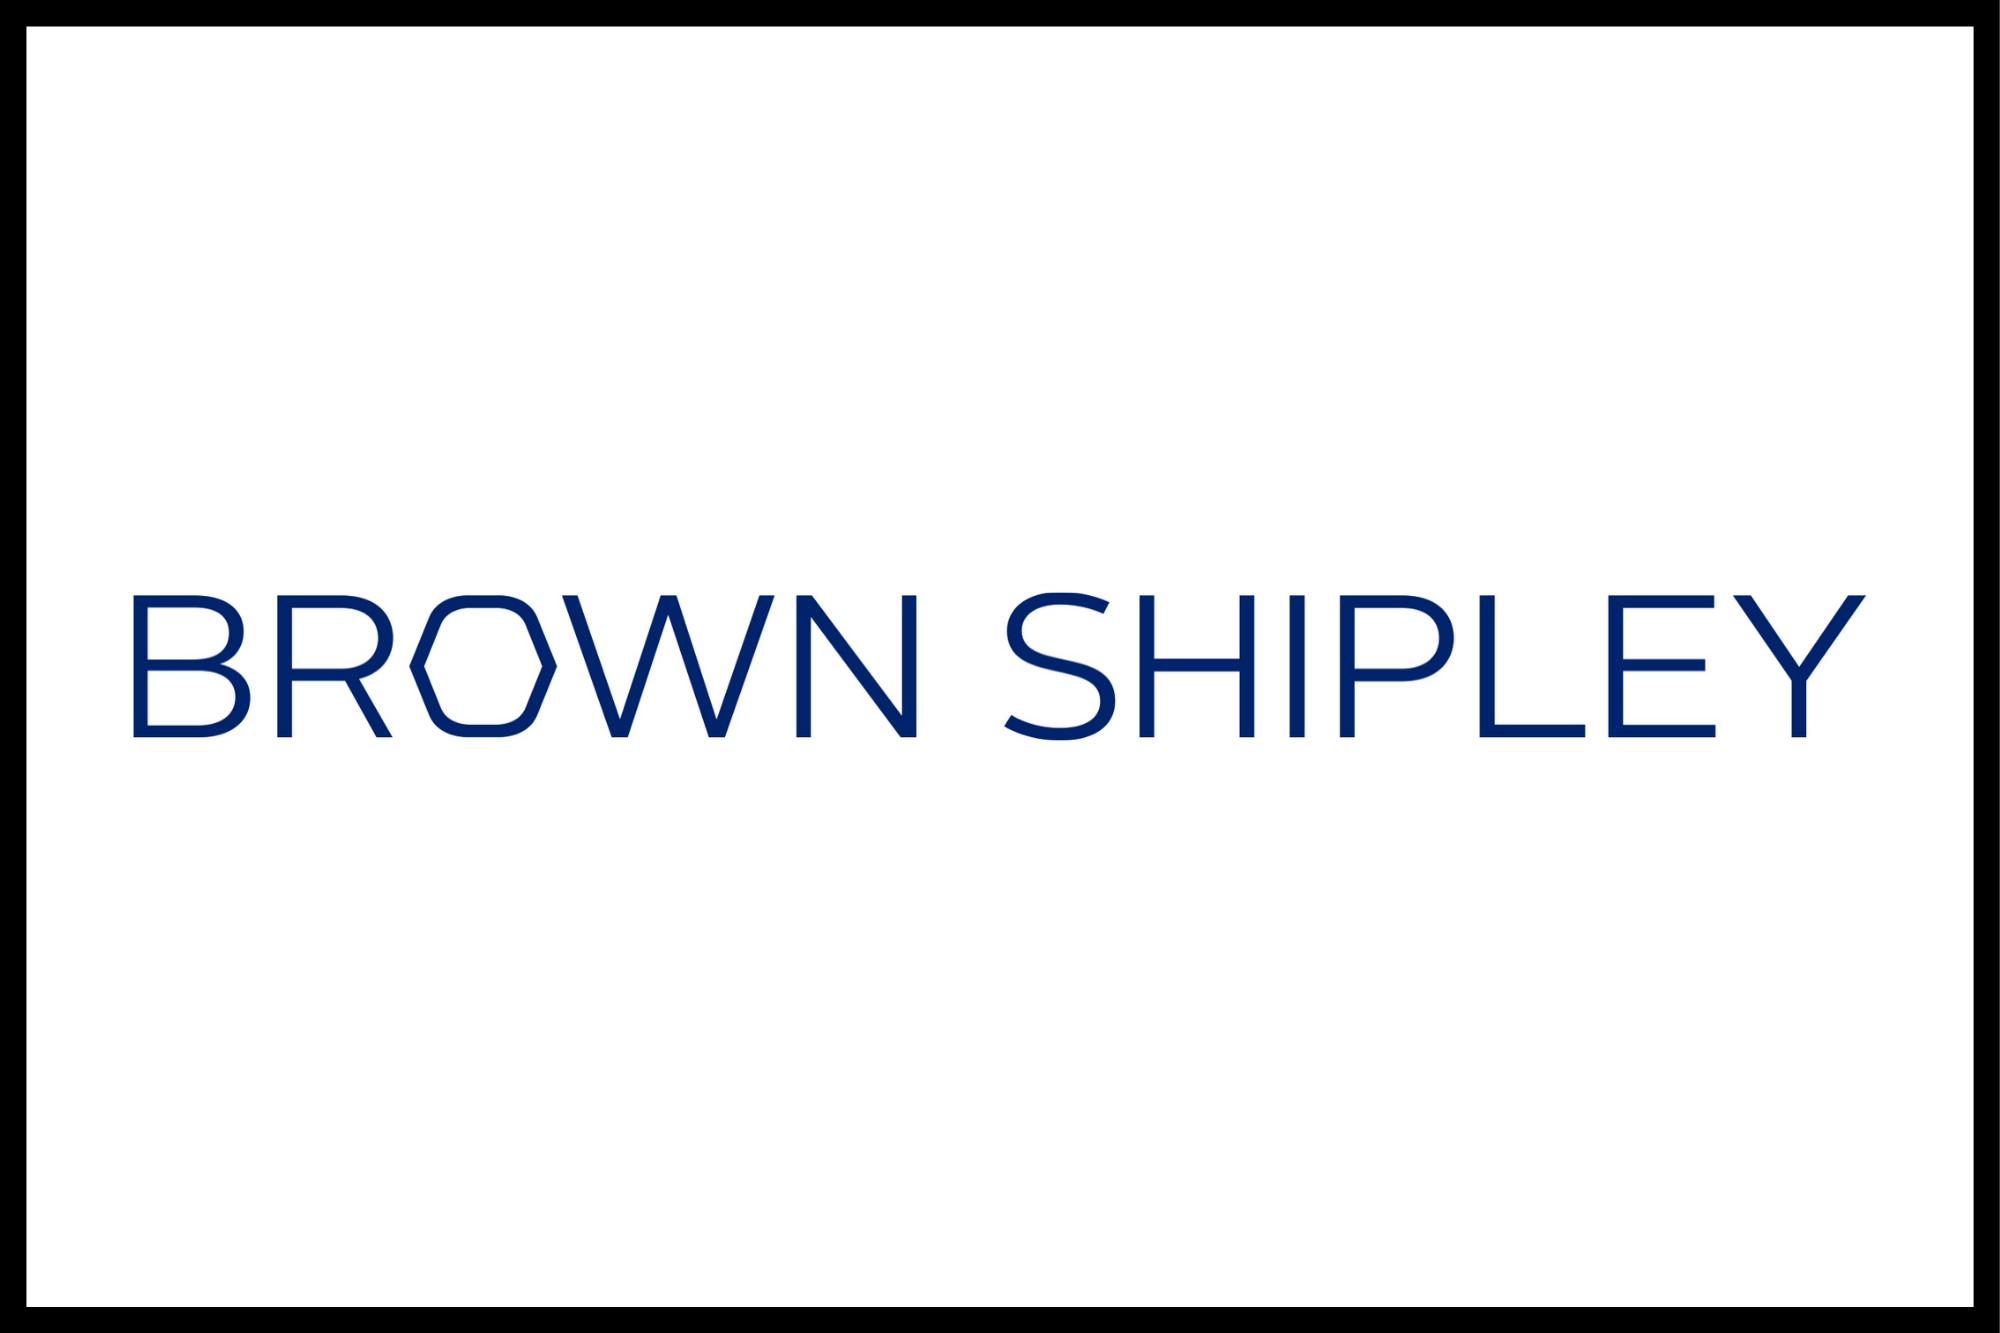 Brown & Shipley